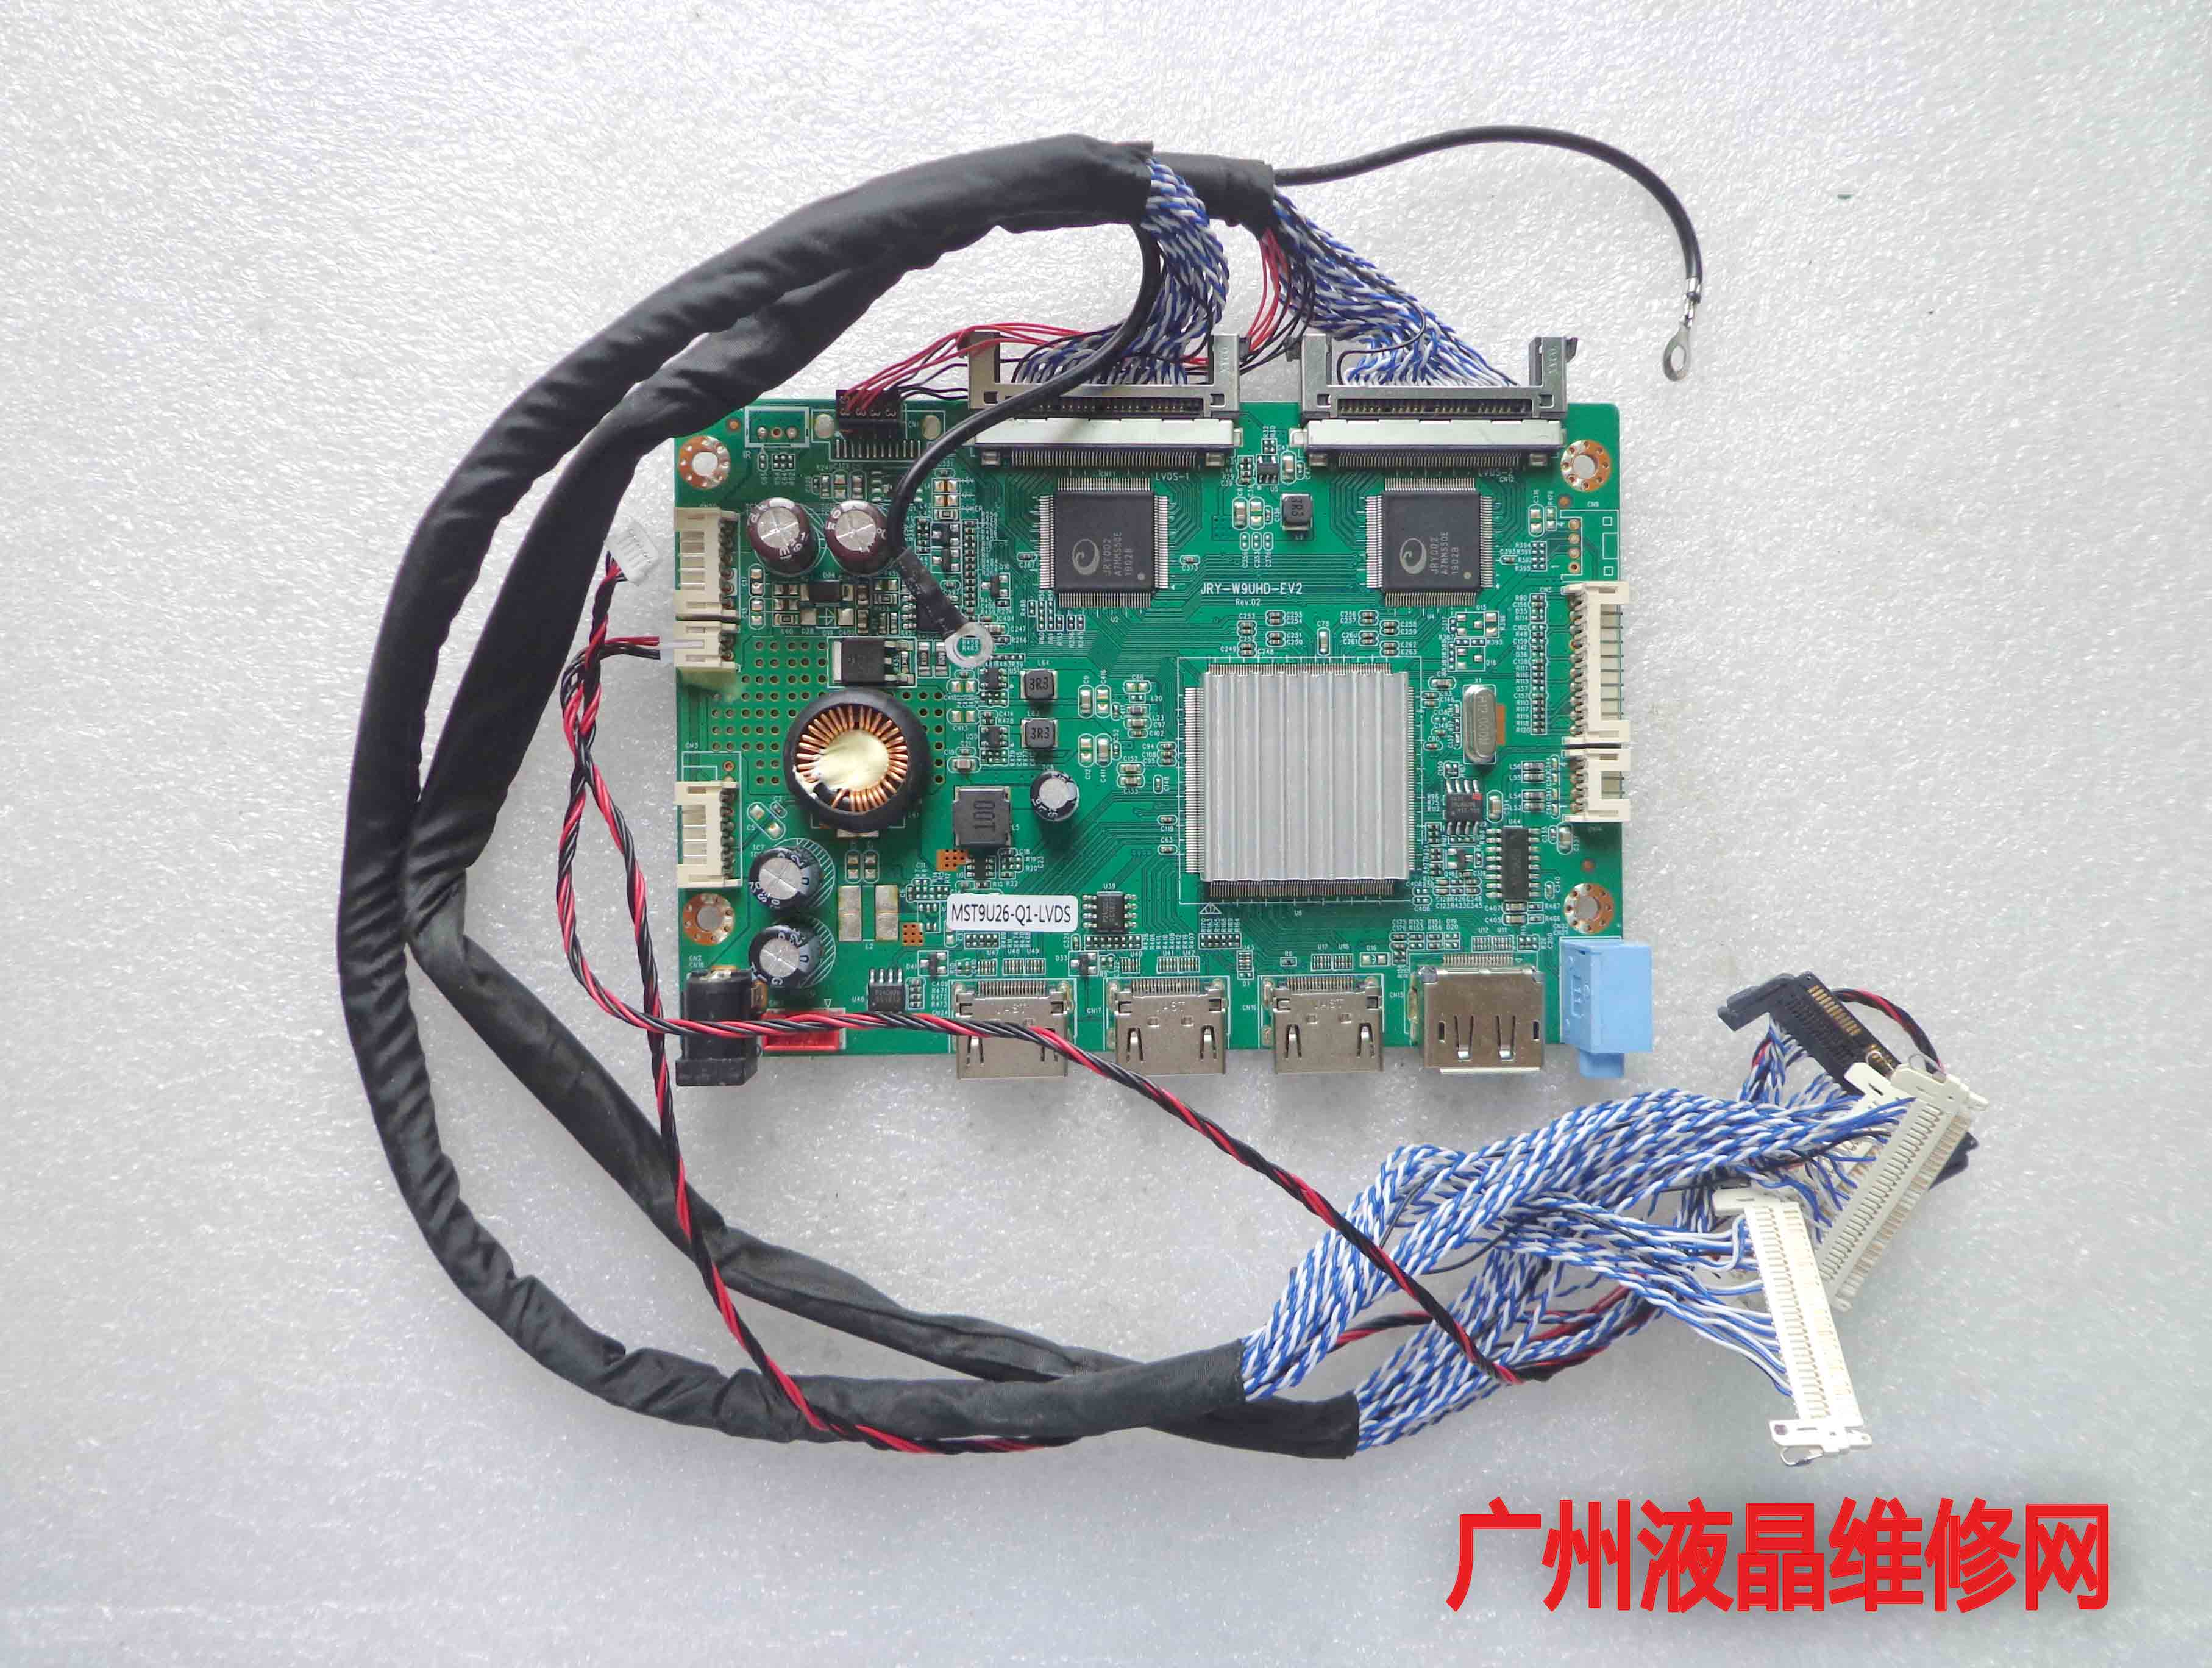 M270DAN02.6 JRY-W9UHD-EV2 144hz M270DTN01.3 2k placa de carro LCD